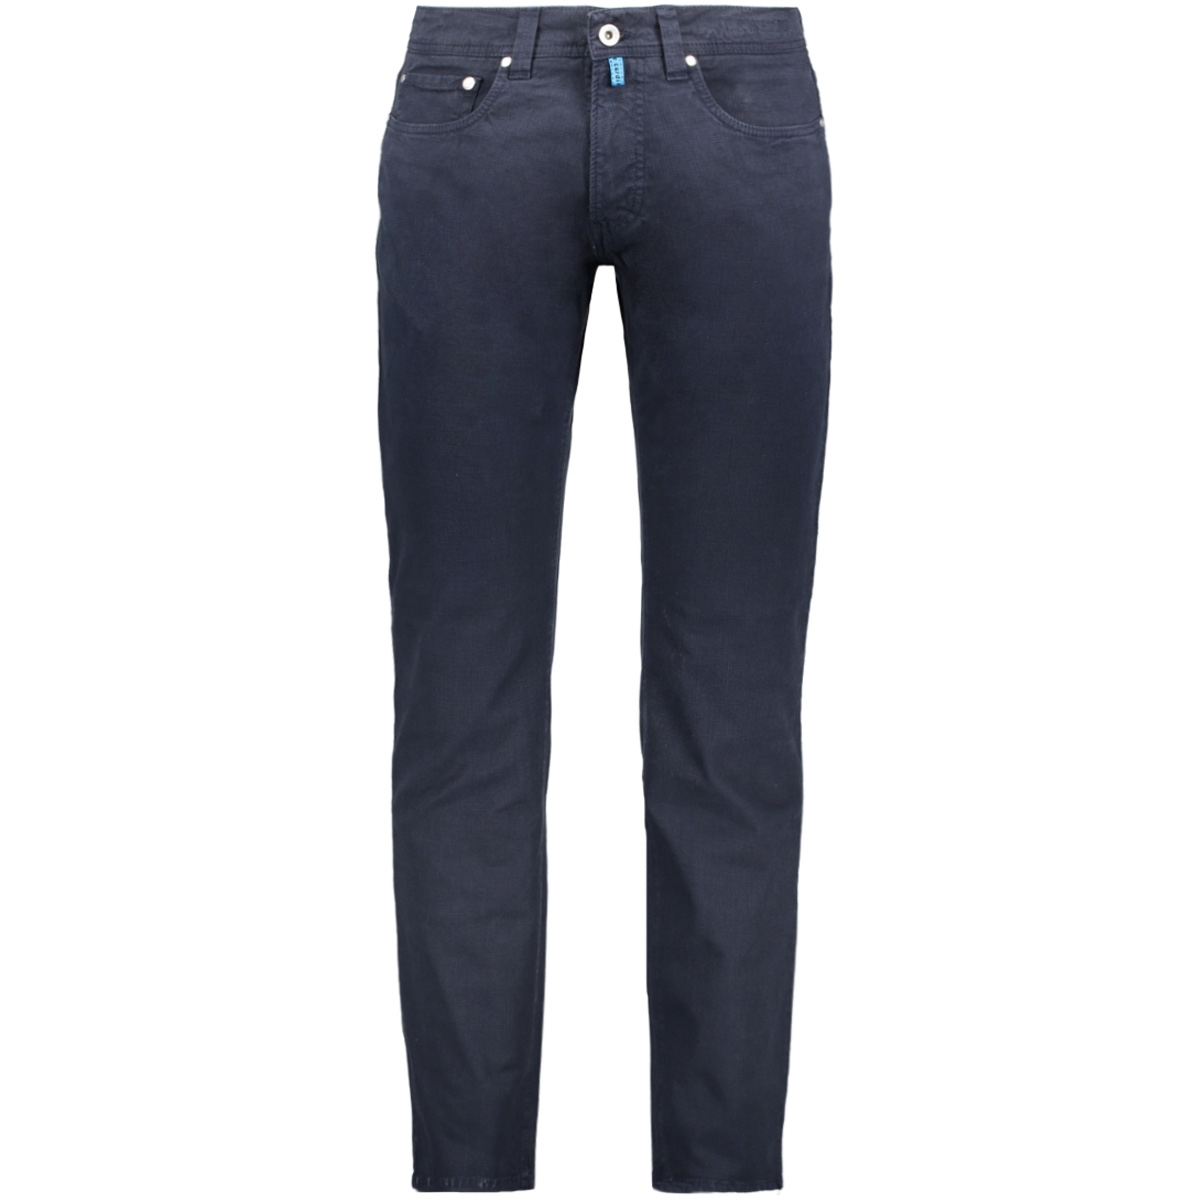 lyon future flex 3451 pierre cardin jeans 2323.68